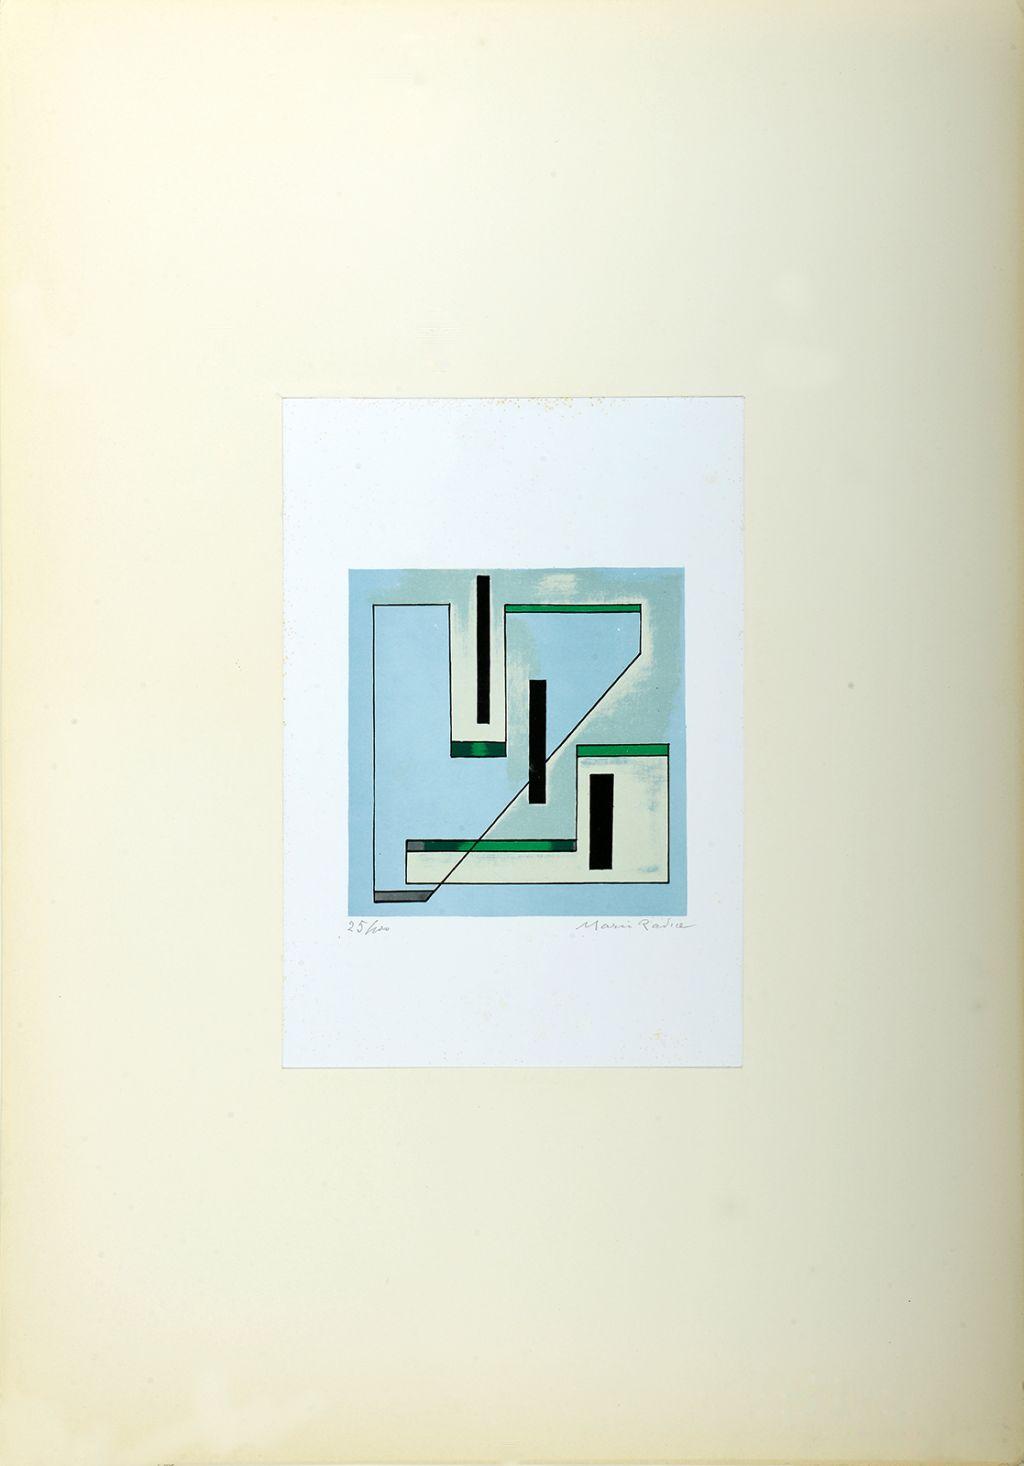 radice-mario-serigrafia